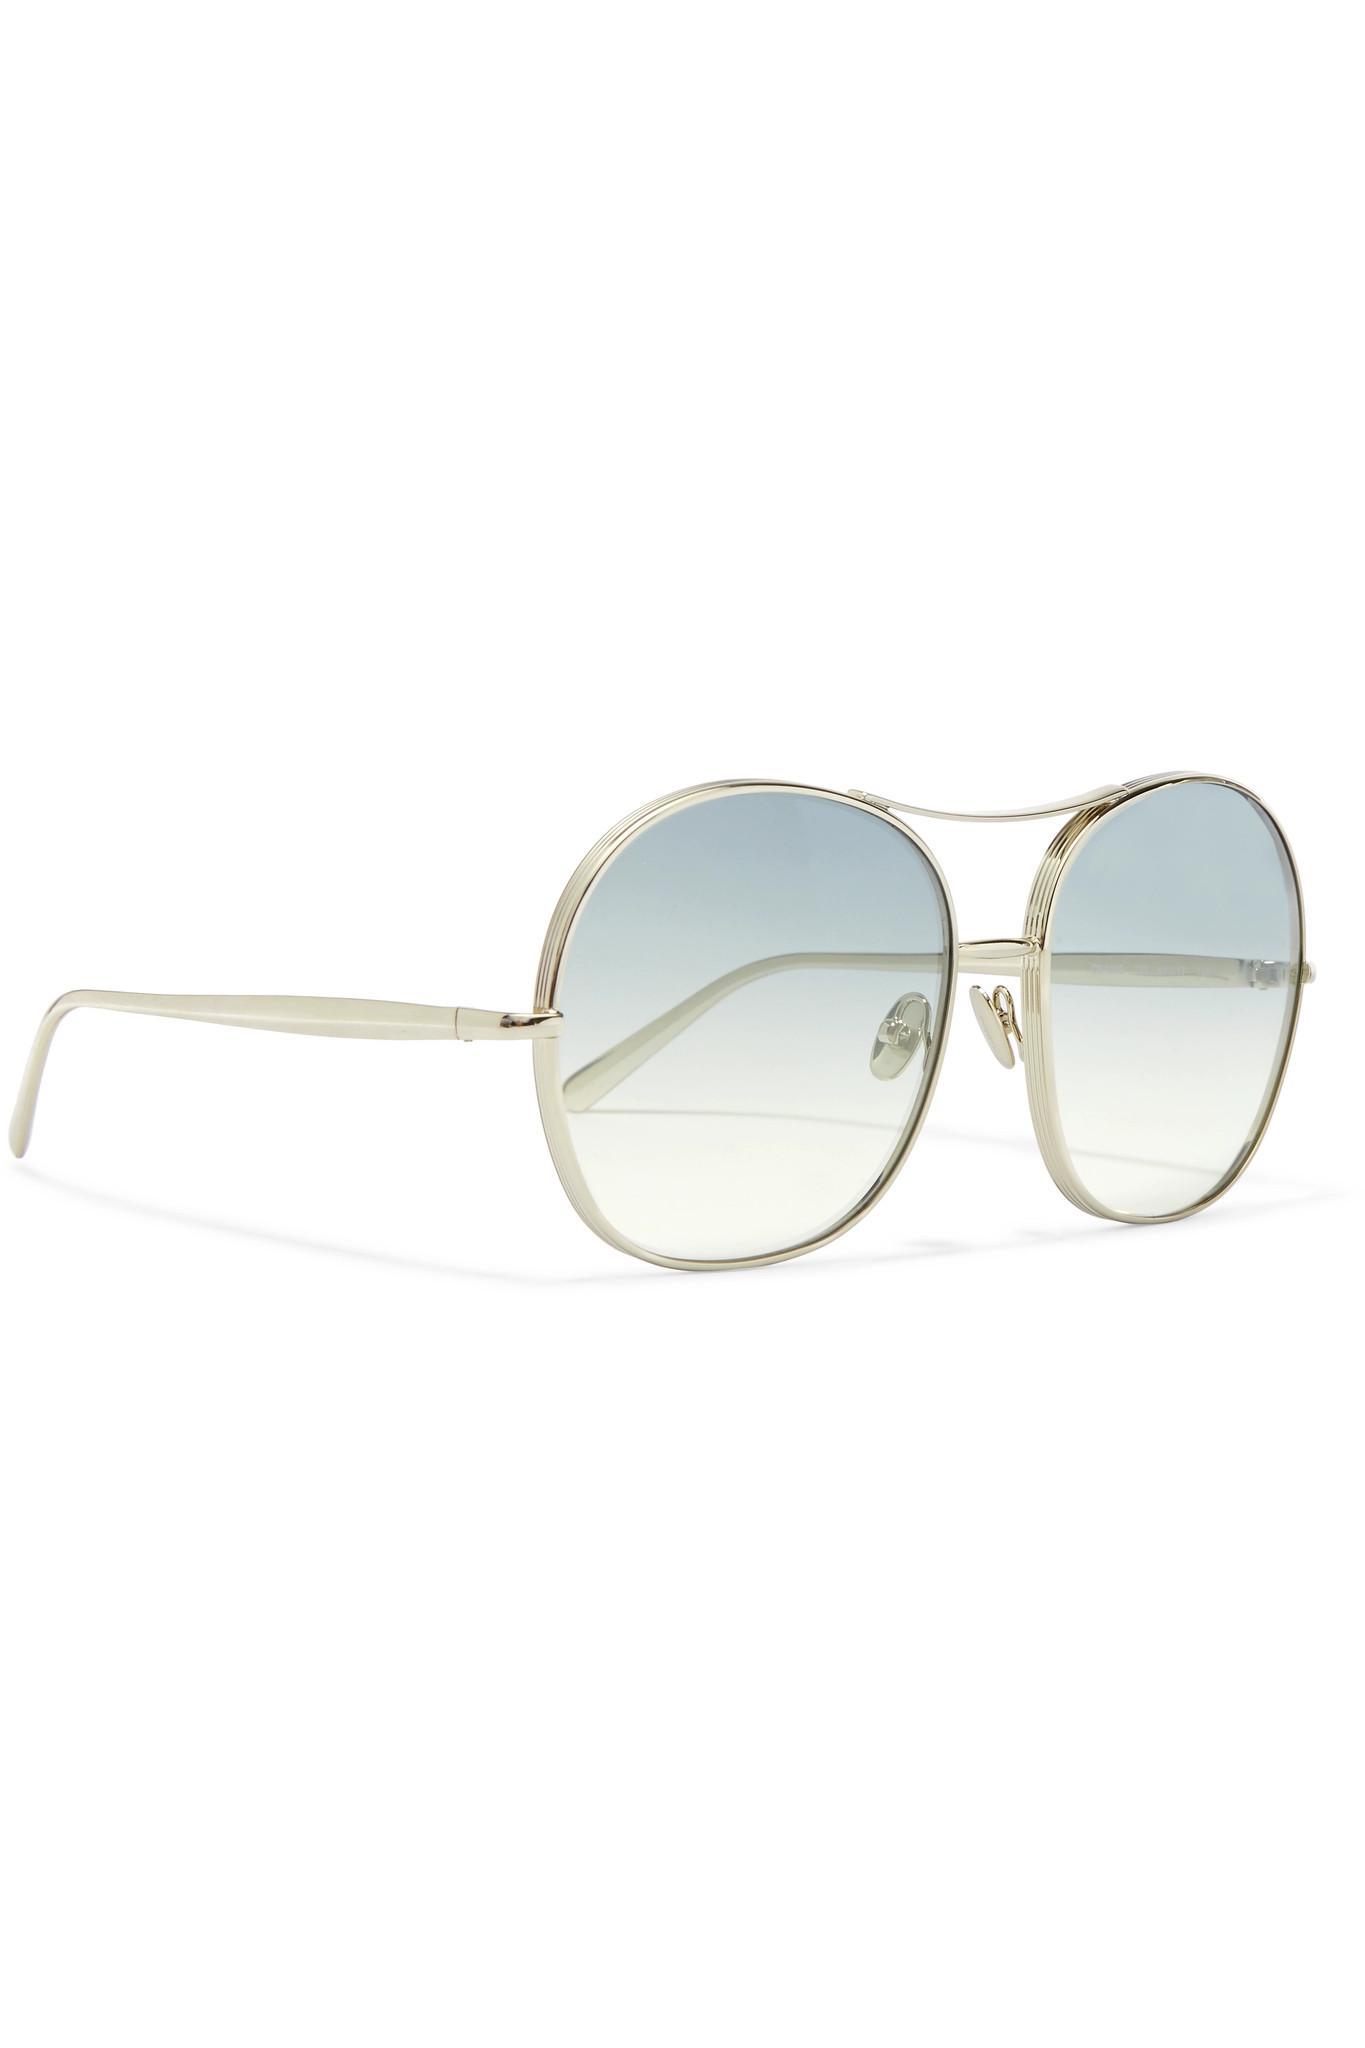 2436981f7611 Lyst - Chloé Nola Oversized Square-frame Gold-tone Sunglasses Gold ...